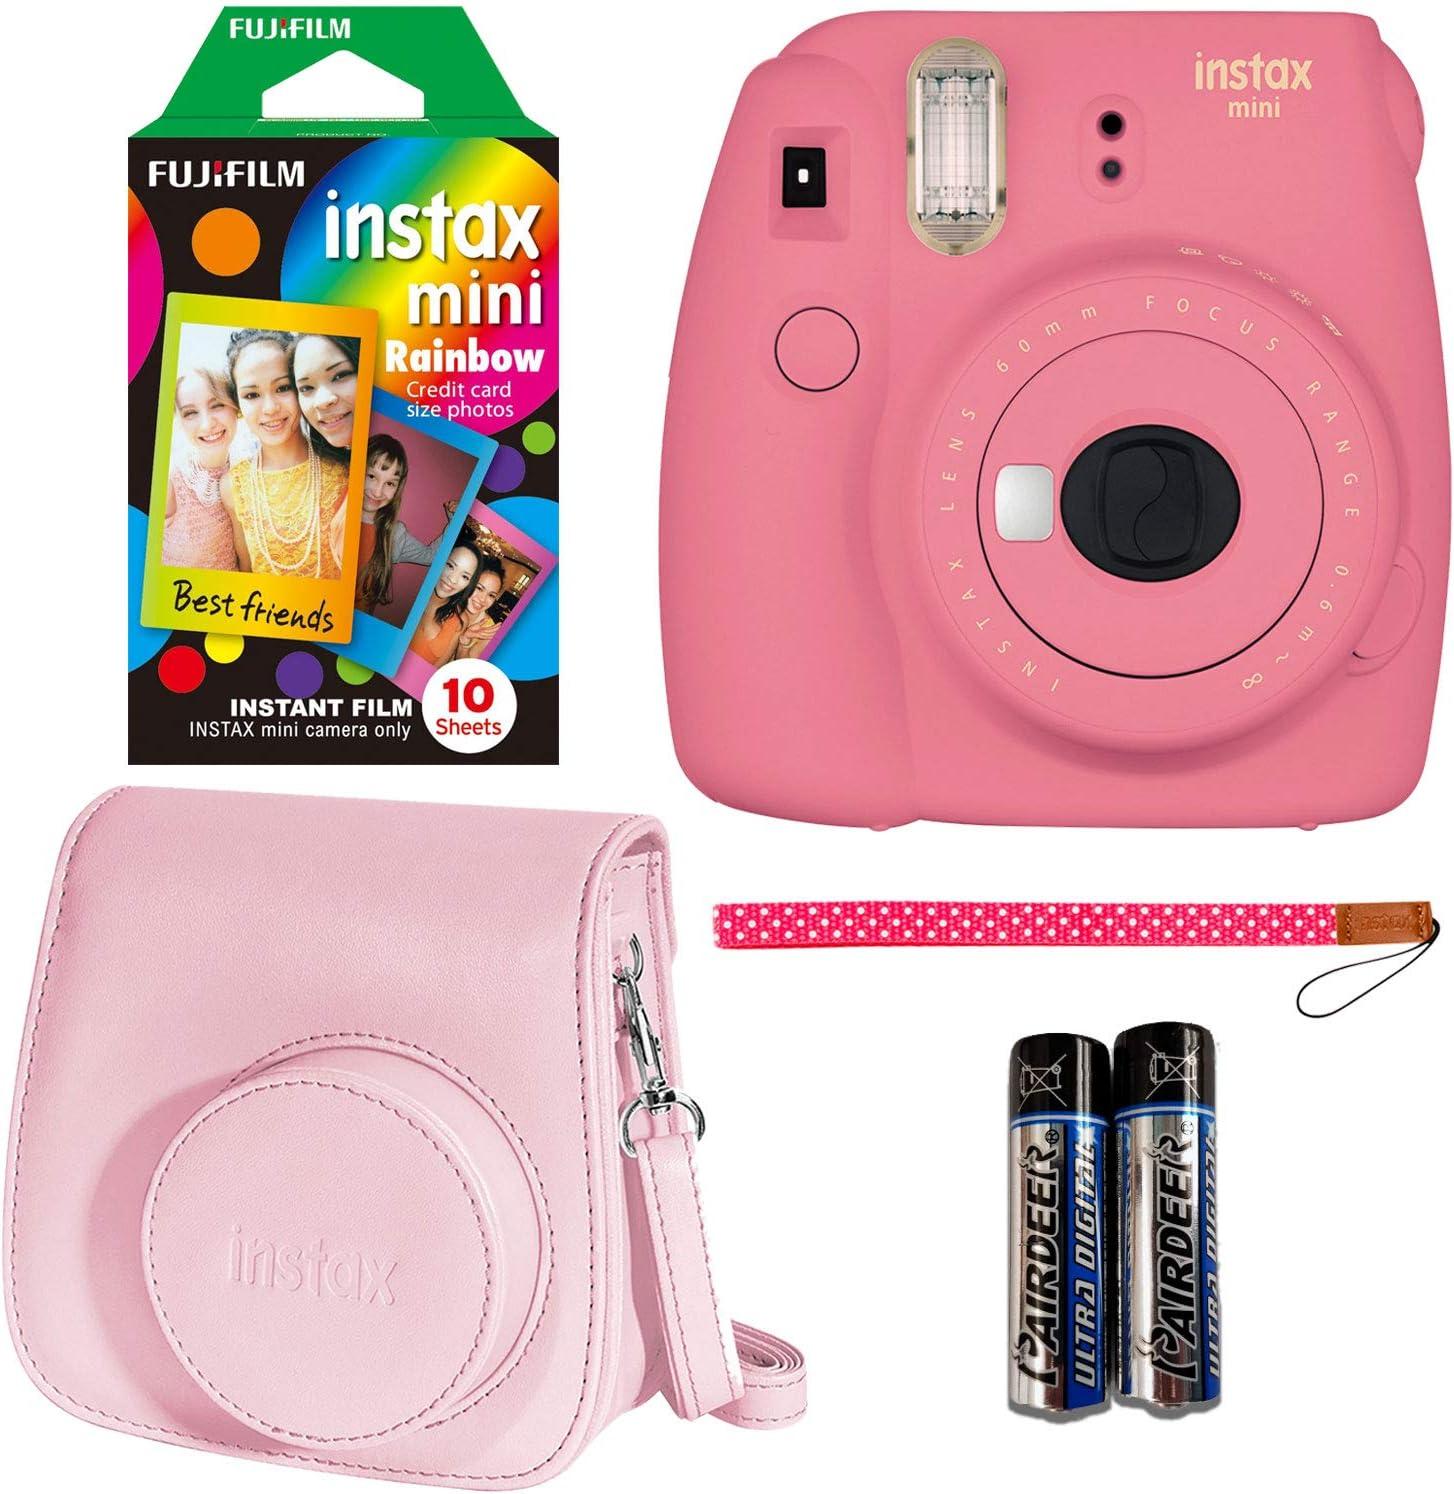 Fujifilm Instax Mini 9 Instant Camera Flamingo Pink Fujifilm Instant Mini Rainbow Film And Fujifilm Instax Groovy Camera Case Pink Camera Photo